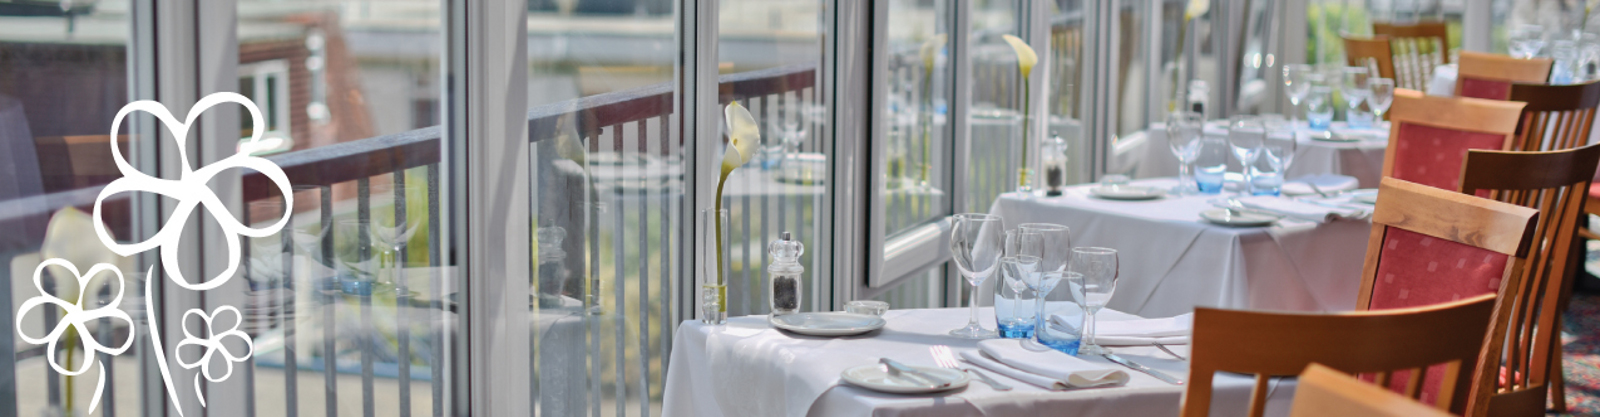 Cunarder & Conservatory Restaurant Bournemouth